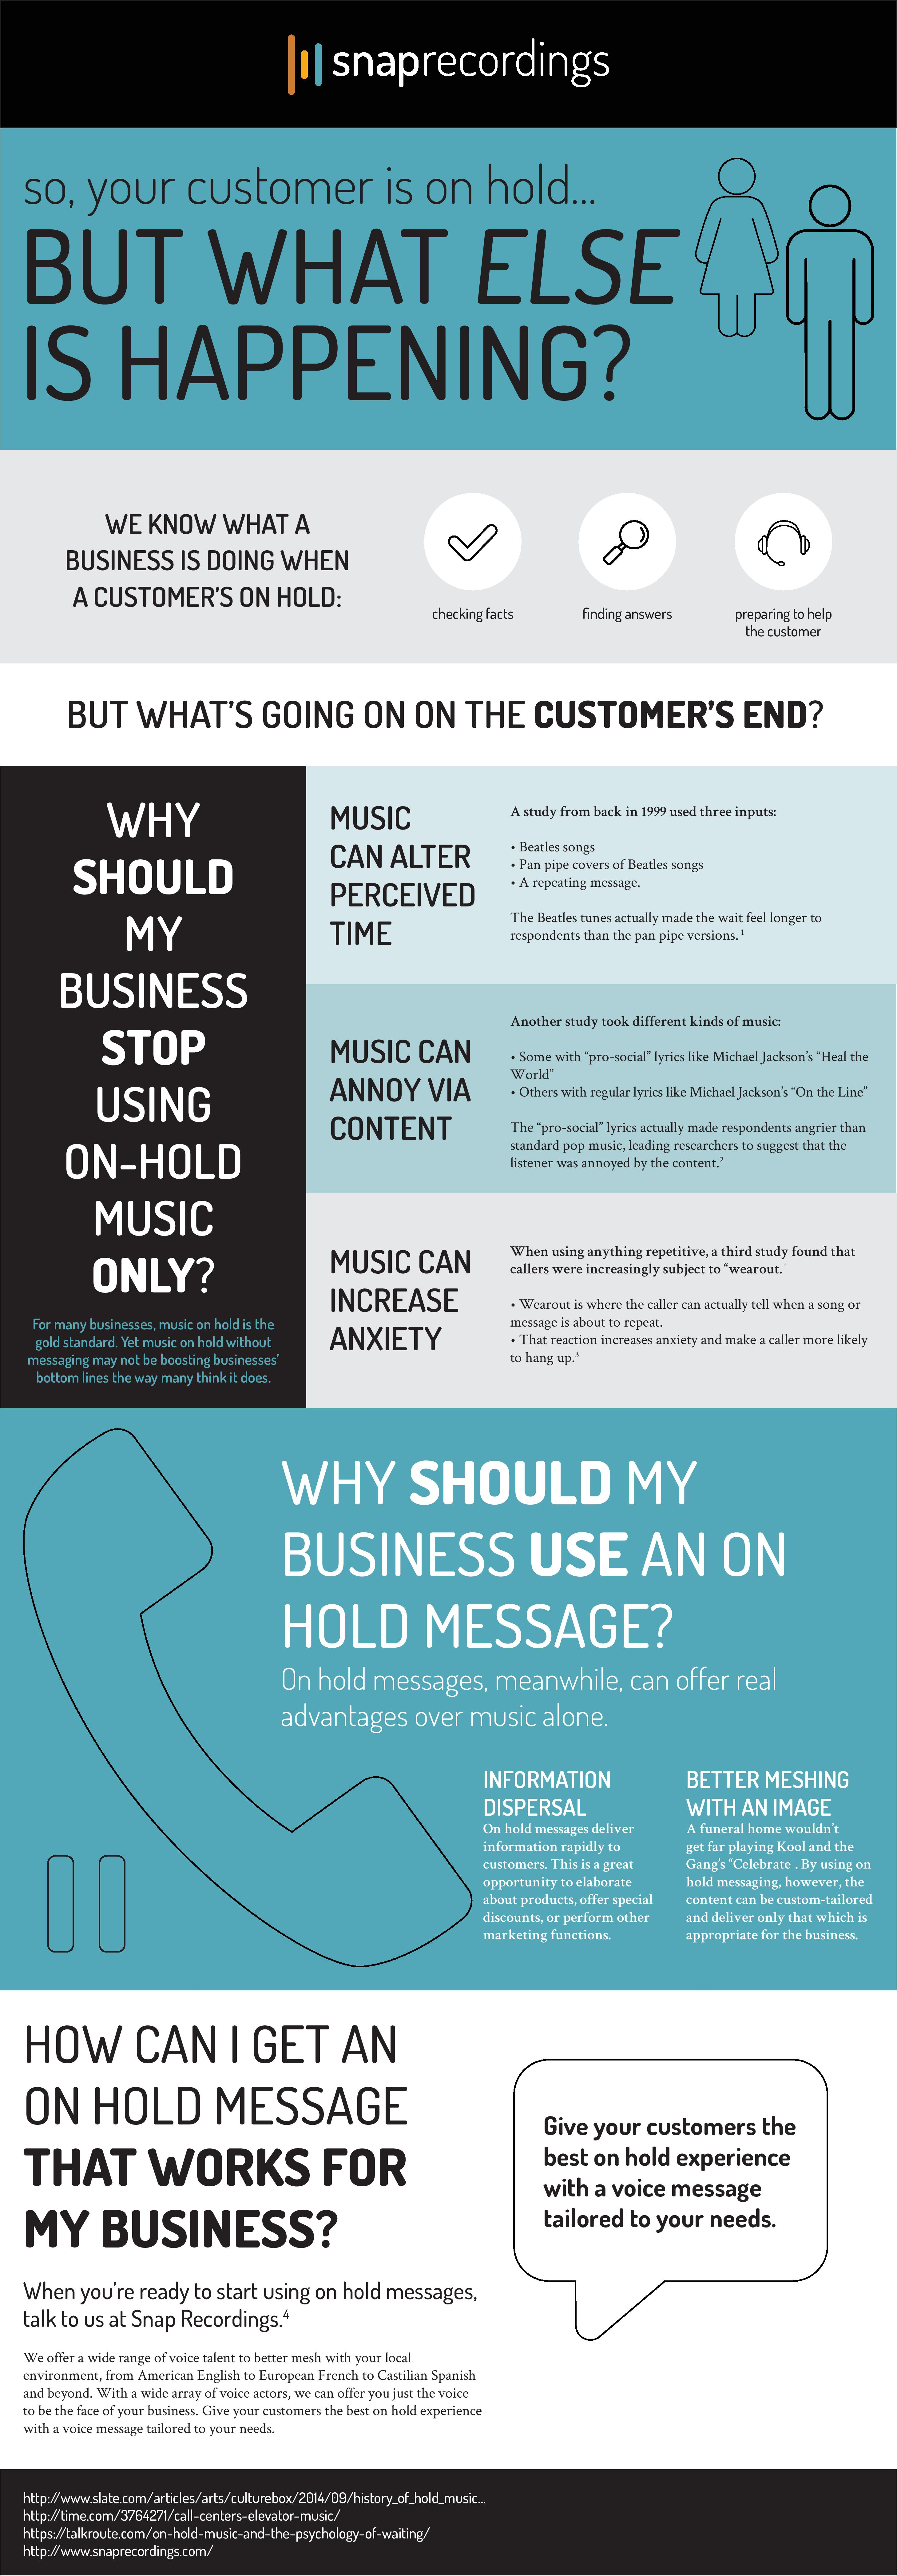 Q3_Infographic-V2-page-001.jpg